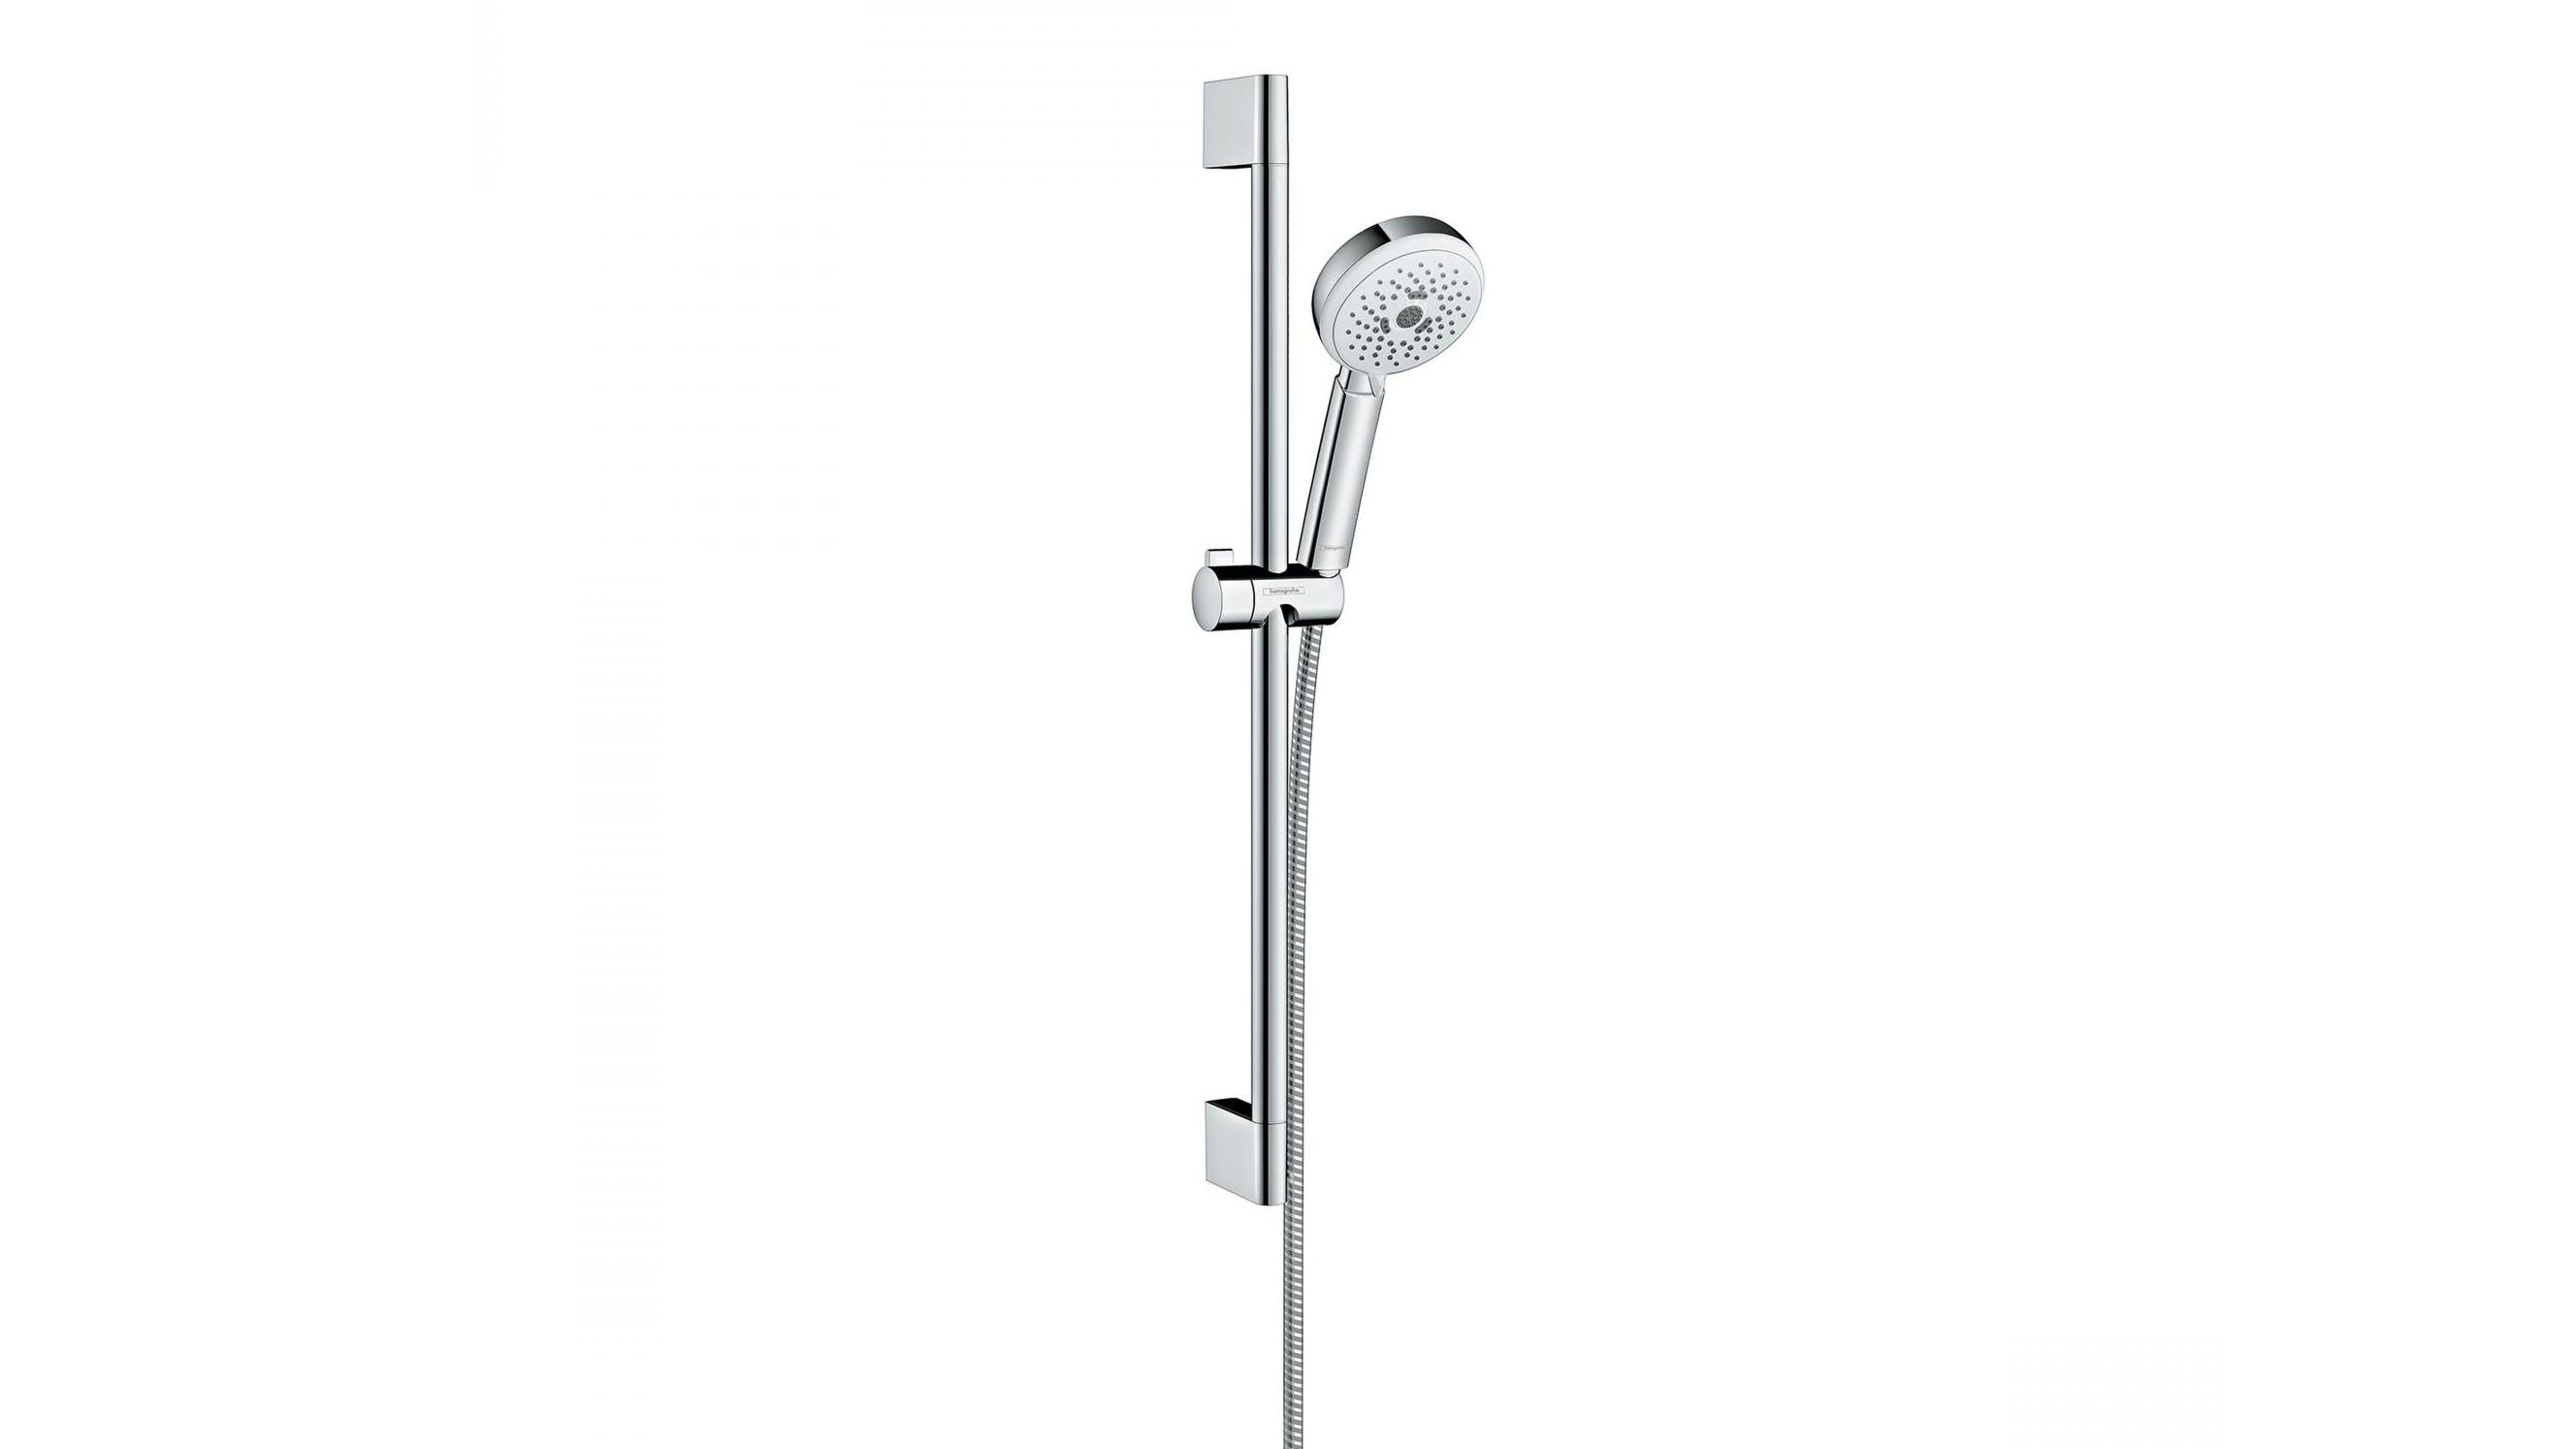 Hansgrohe Crometta 100 EcoSmart Shower Rail - White and Chrome | Domayne